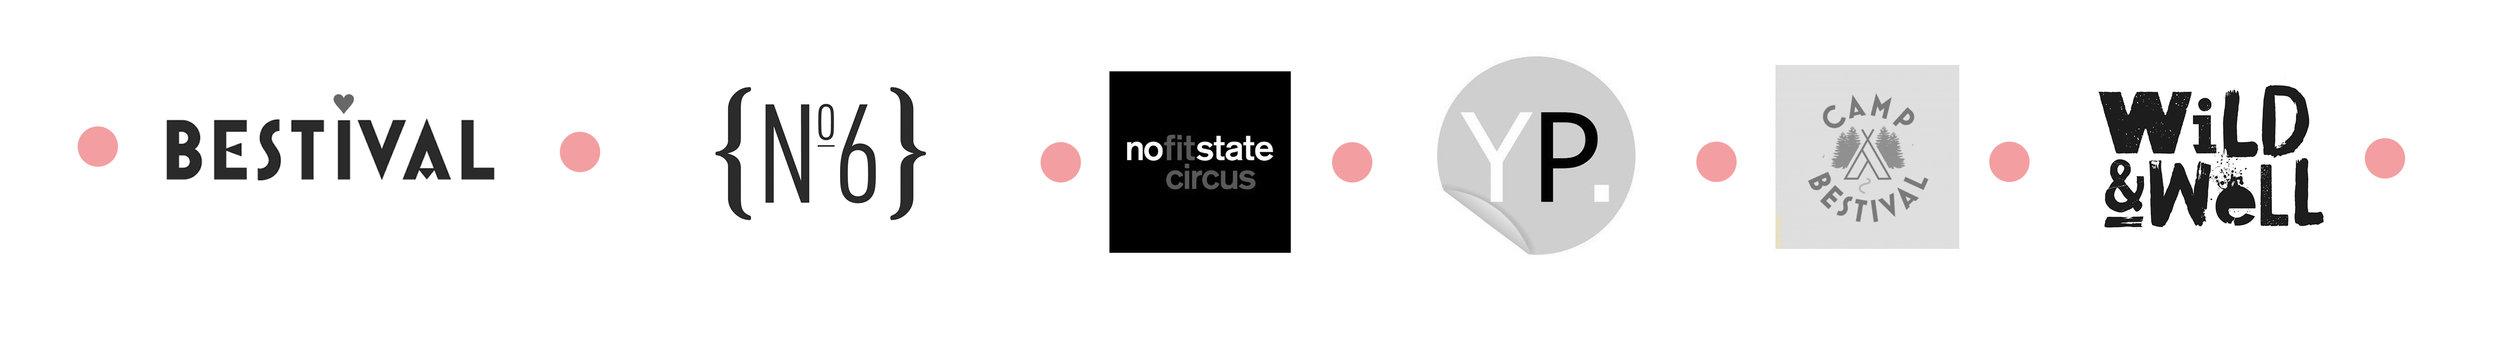 logo sheet 3.jpg